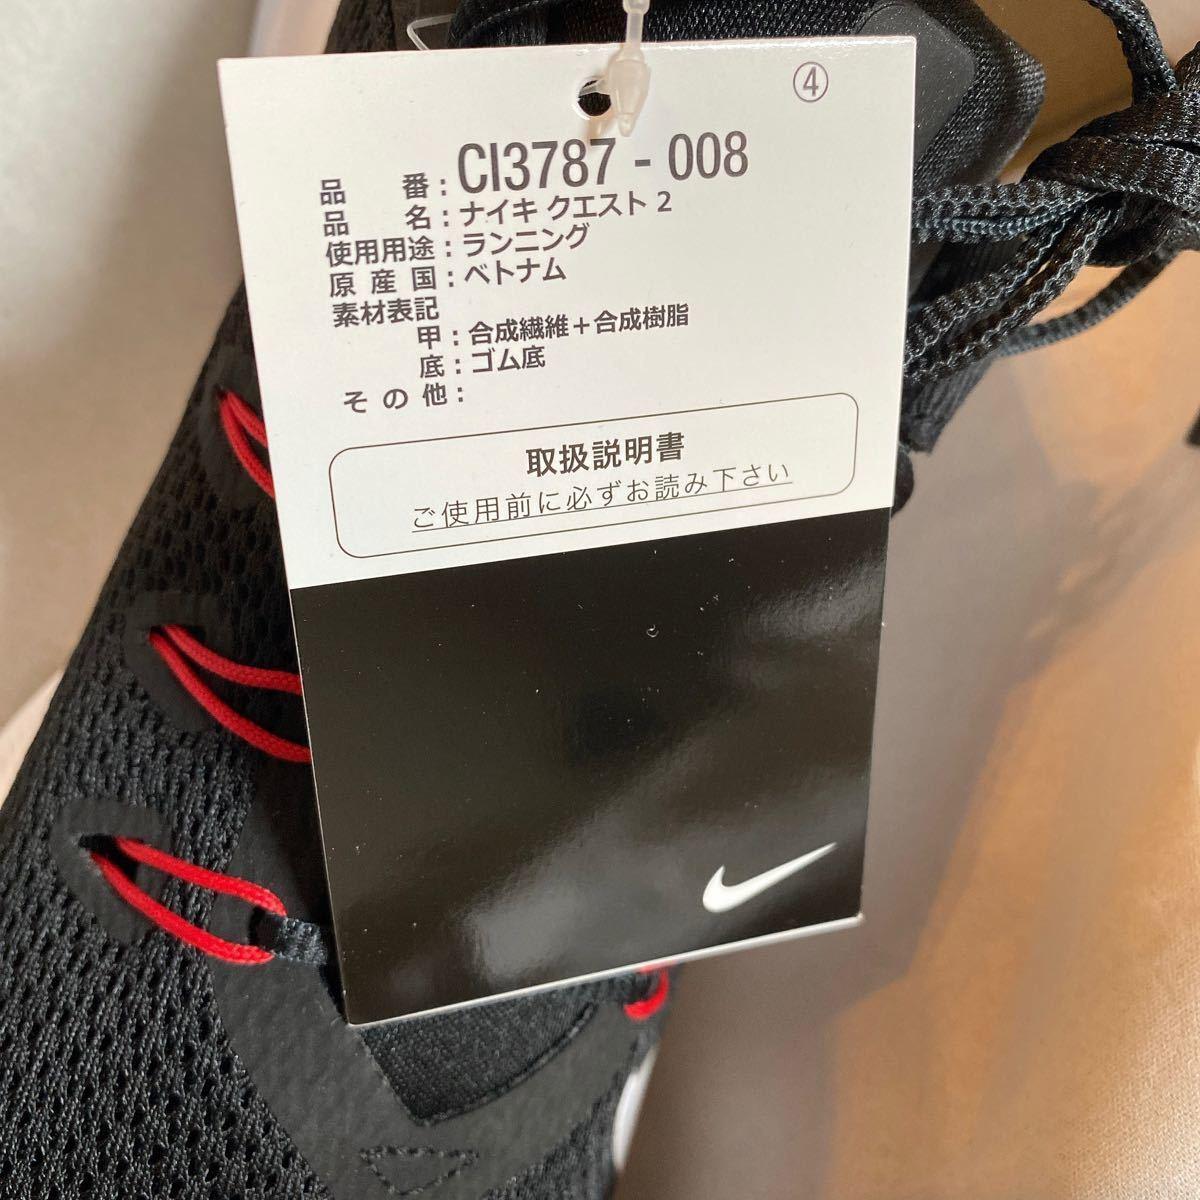 【NIKE】QUEST 2 CI3787 ランニング シューズ スニーカー【27cm】